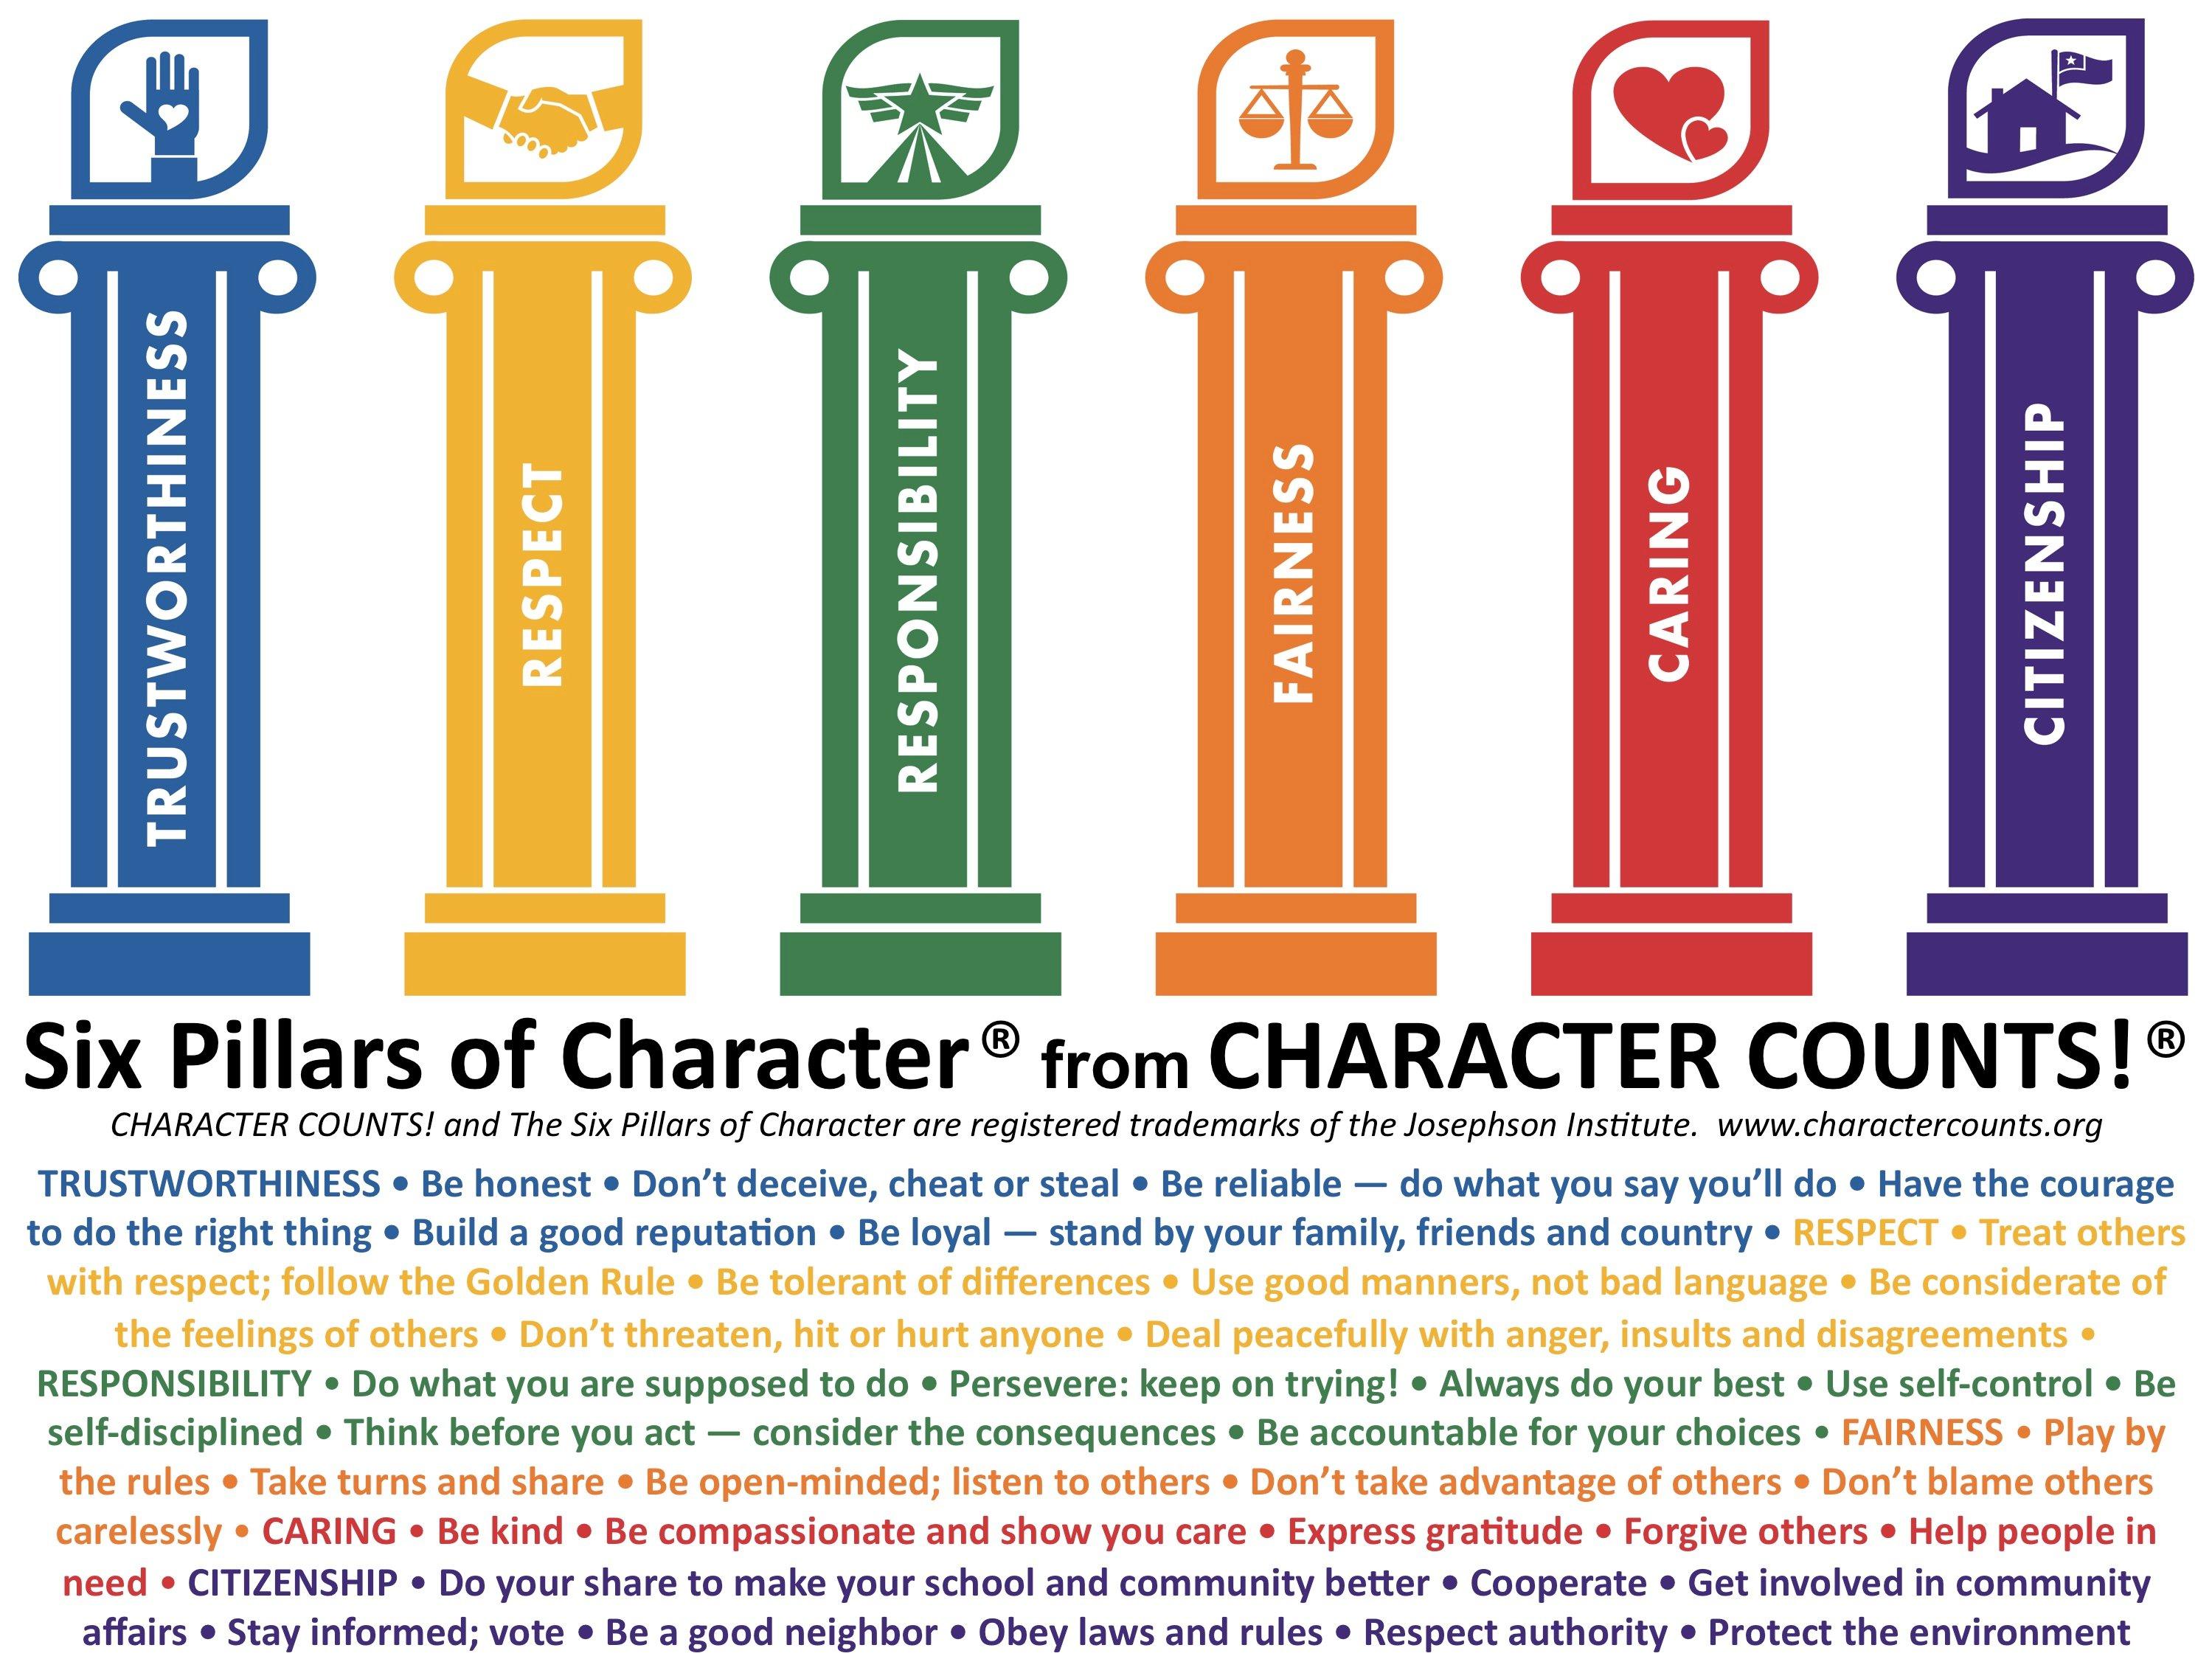 Worksheets Character Counts Worksheets character counts worksheets rupsucks printables mreichert kids 3